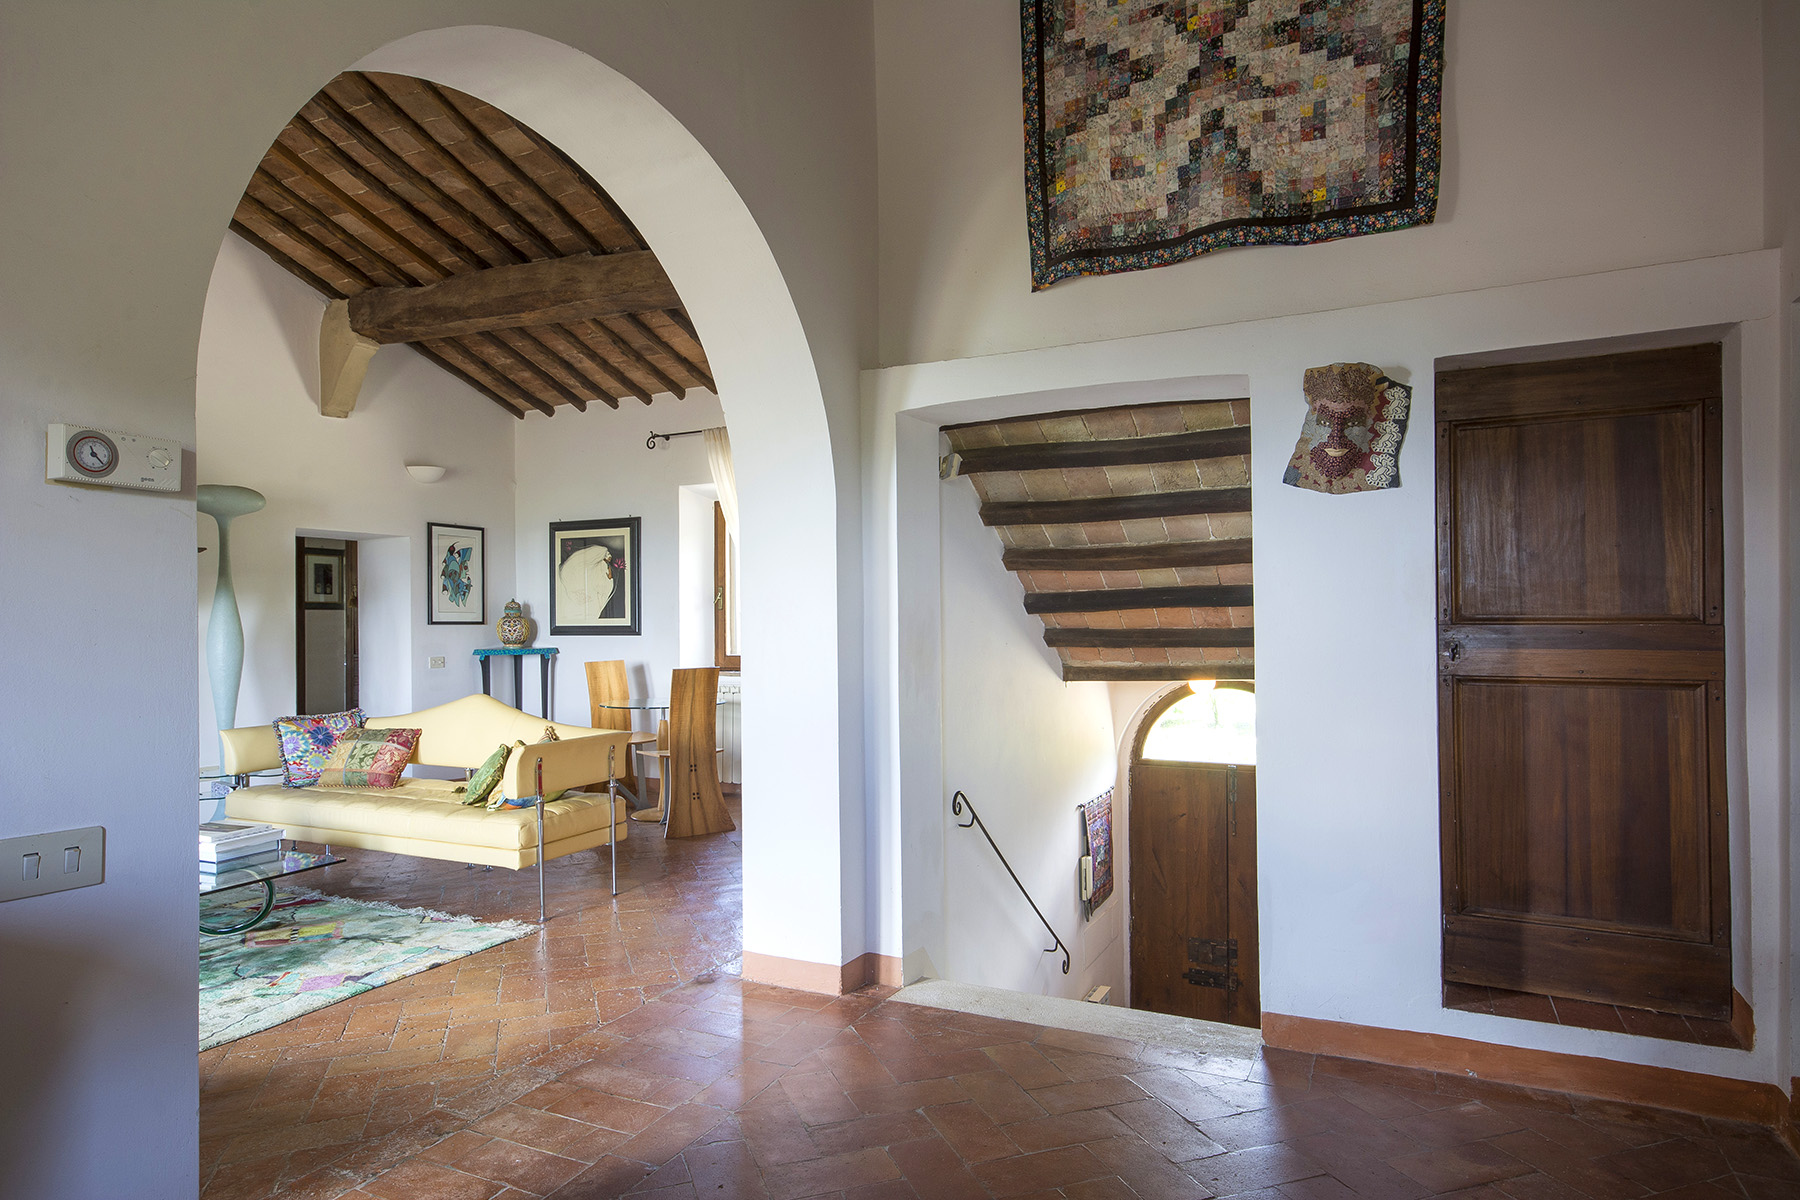 Casa indipendente in Vendita a Pienza: 5 locali, 400 mq - Foto 14